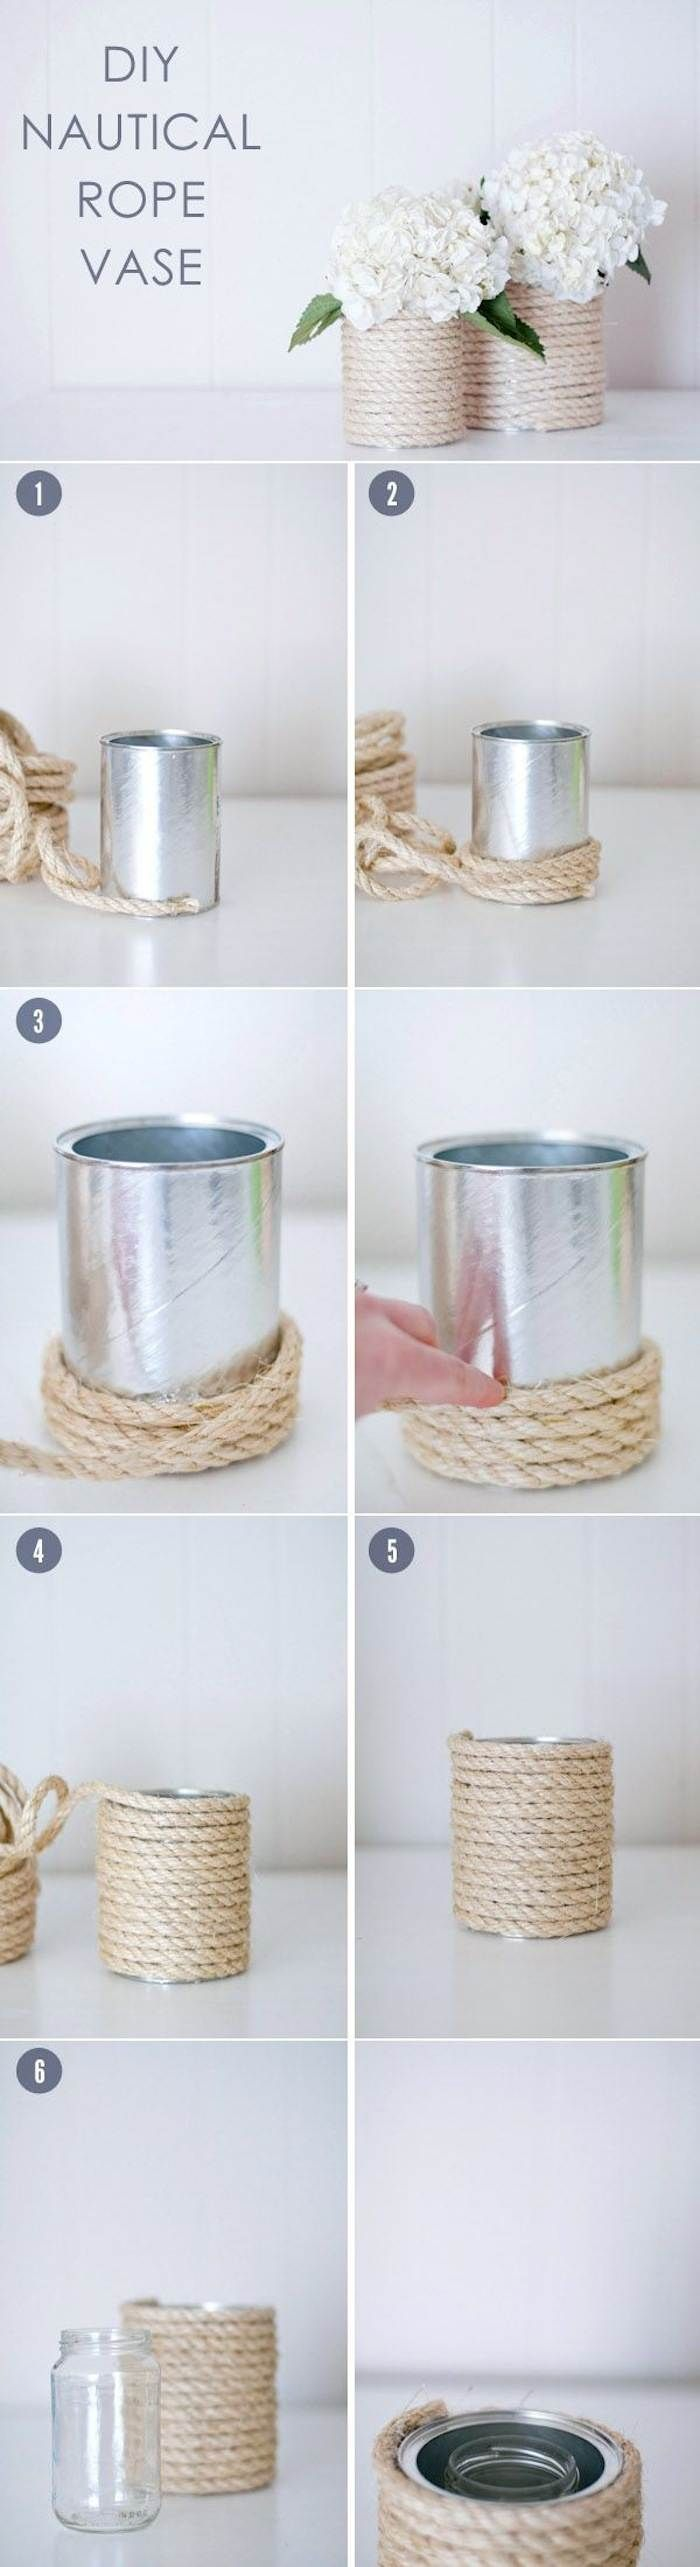 Chic Nautical Rope Vase - DIY Tutorial: Bayside Bride